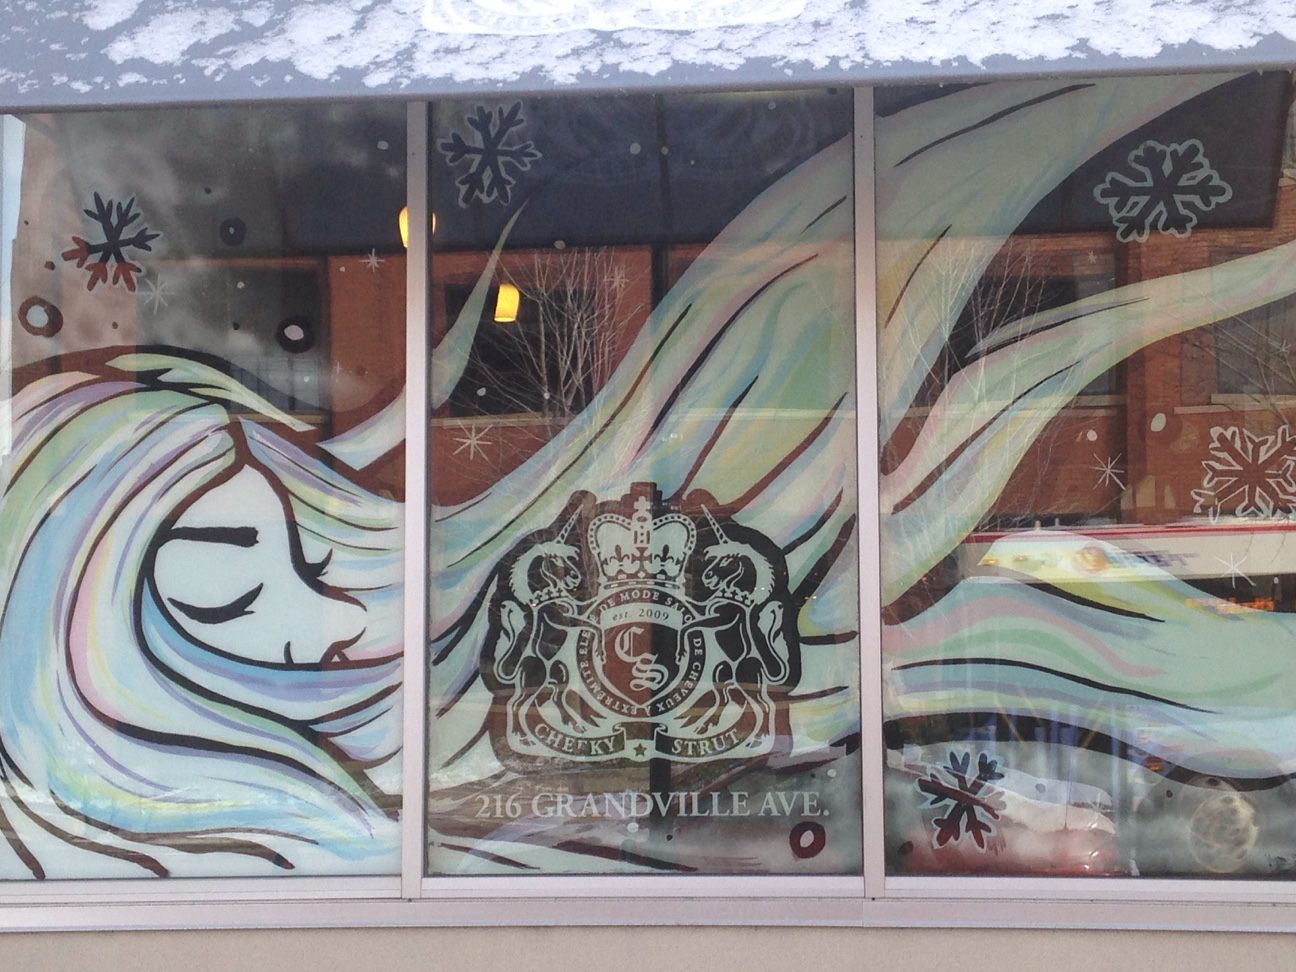 KCAD student design at Cheeky Strut Salon and Spa